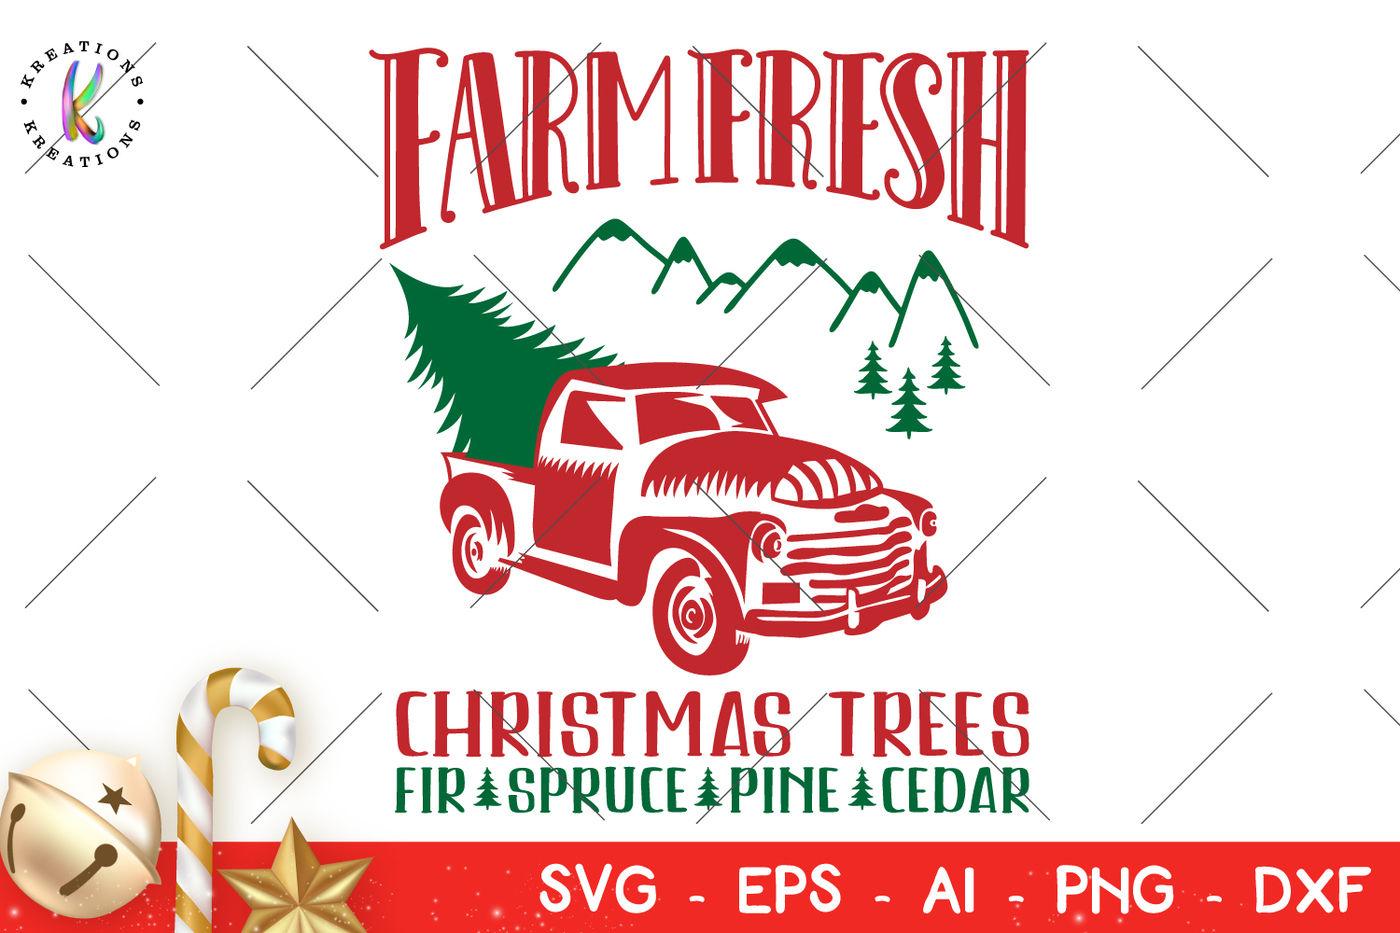 Farm Fresh Christmas Trees Svg.Christmas Svg Farm Fresh Christmas Trees Svg By